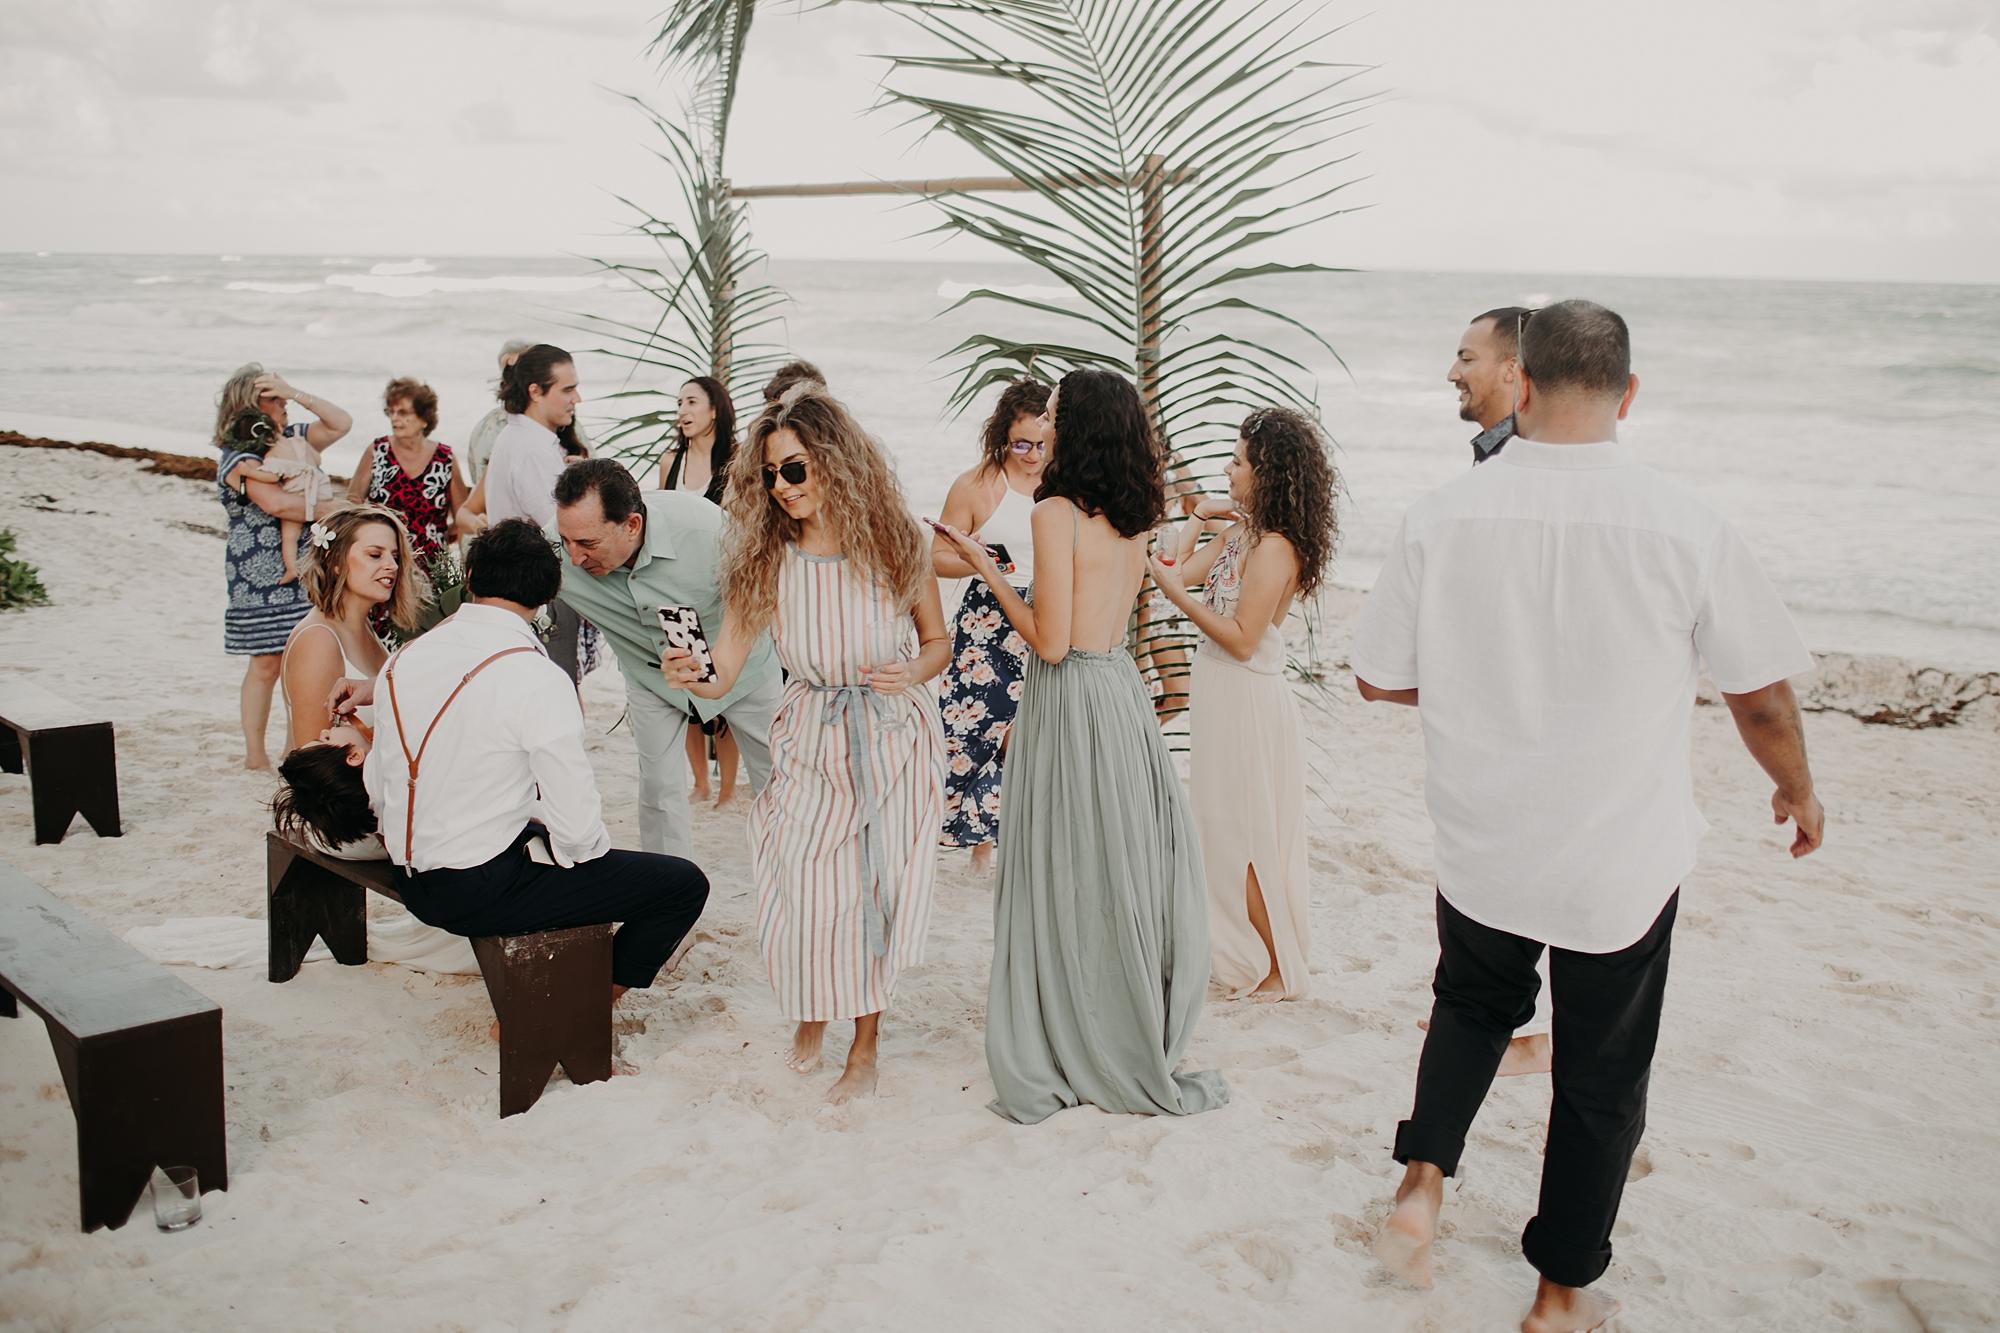 Danielle-San-Antonio-Wedding-Photographer-185_WEB.jpg